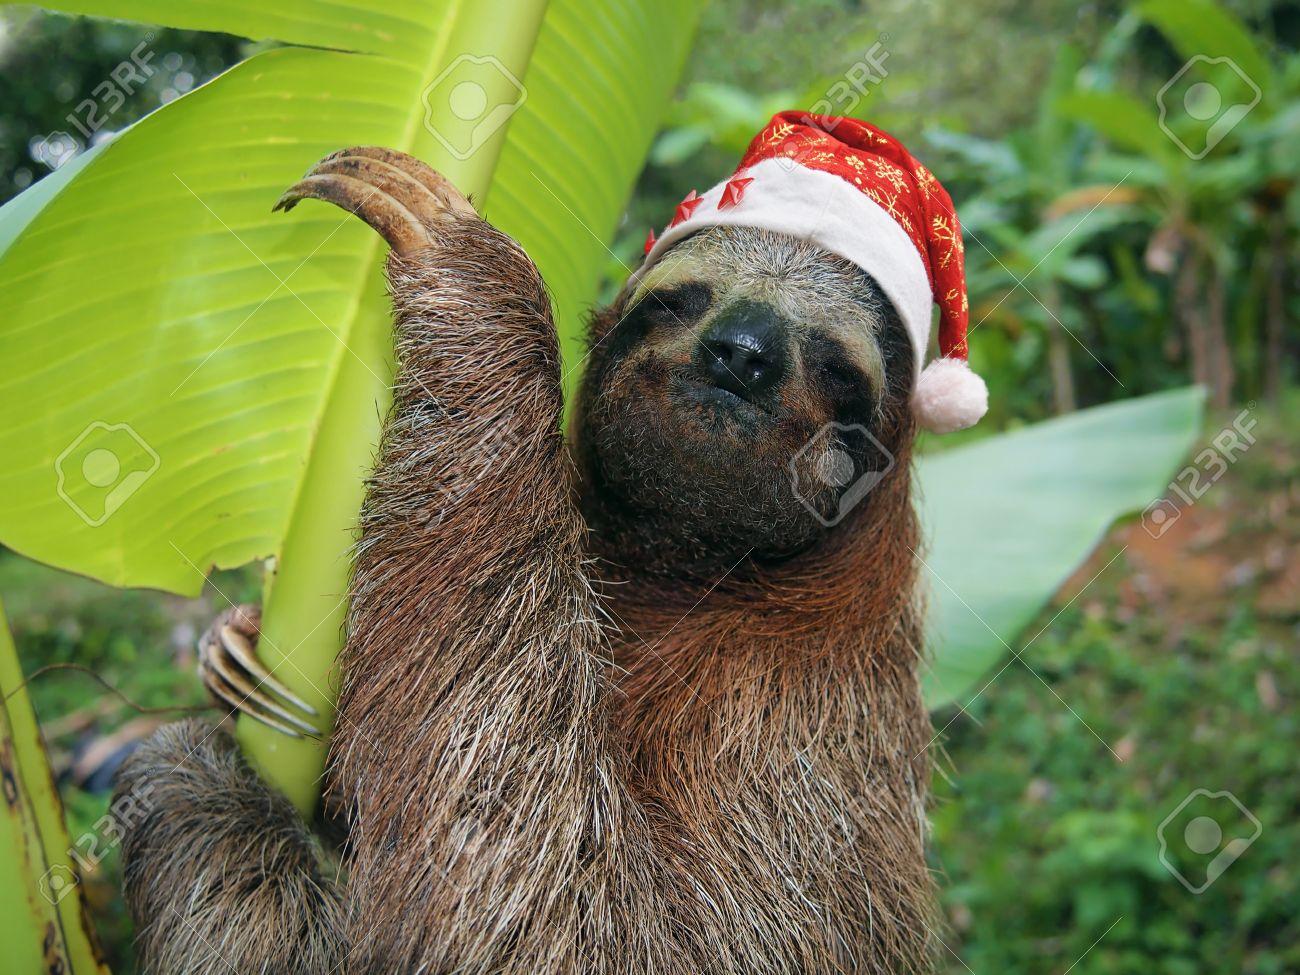 Christmas Sloth.Christmas Animal Portrait Of A Sloth Wearing A Santa Hat Costa